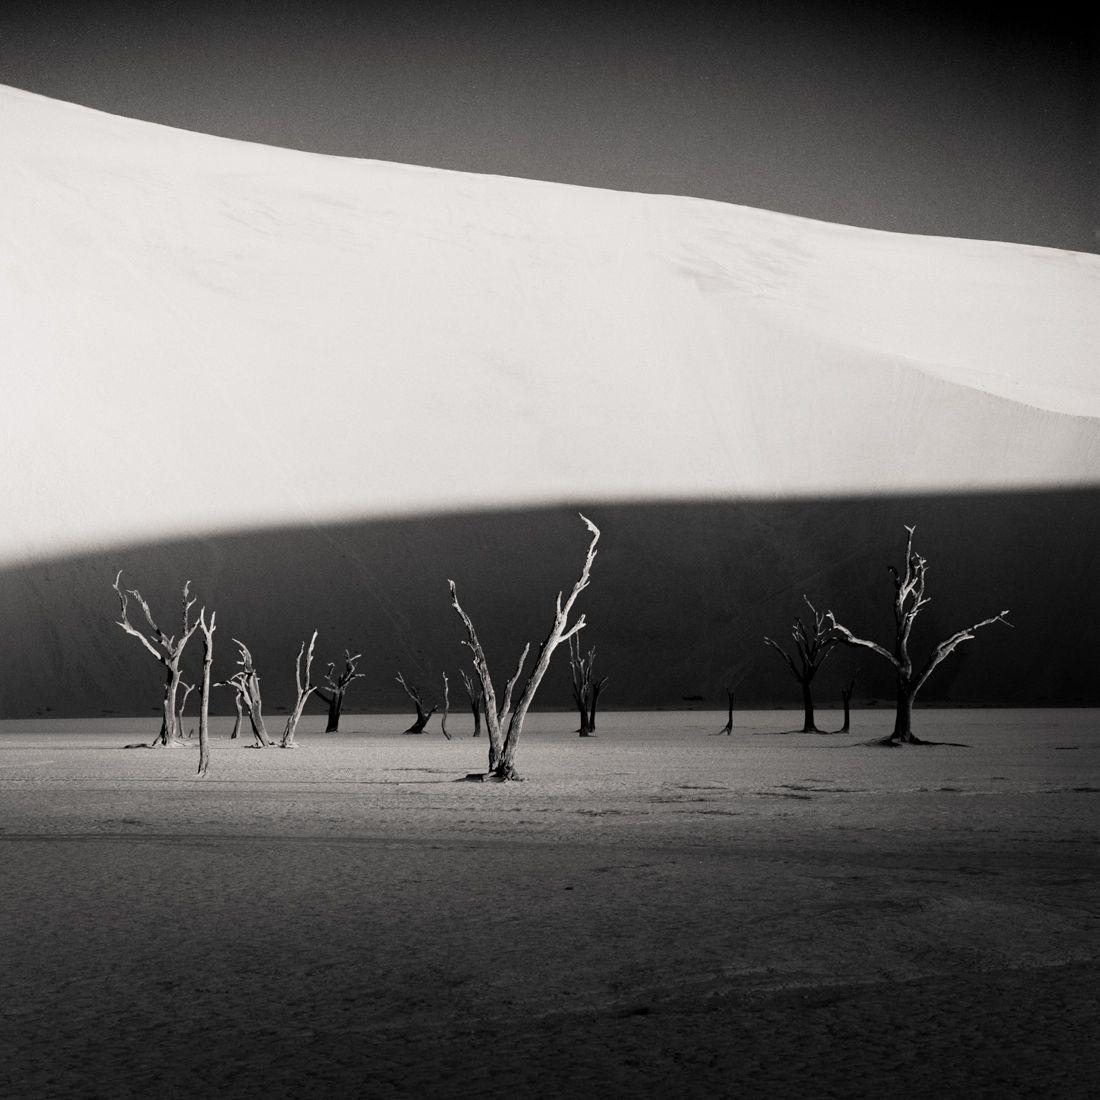 Sossusvlei-Trees-By-Hector-Izquierdo-Seliva